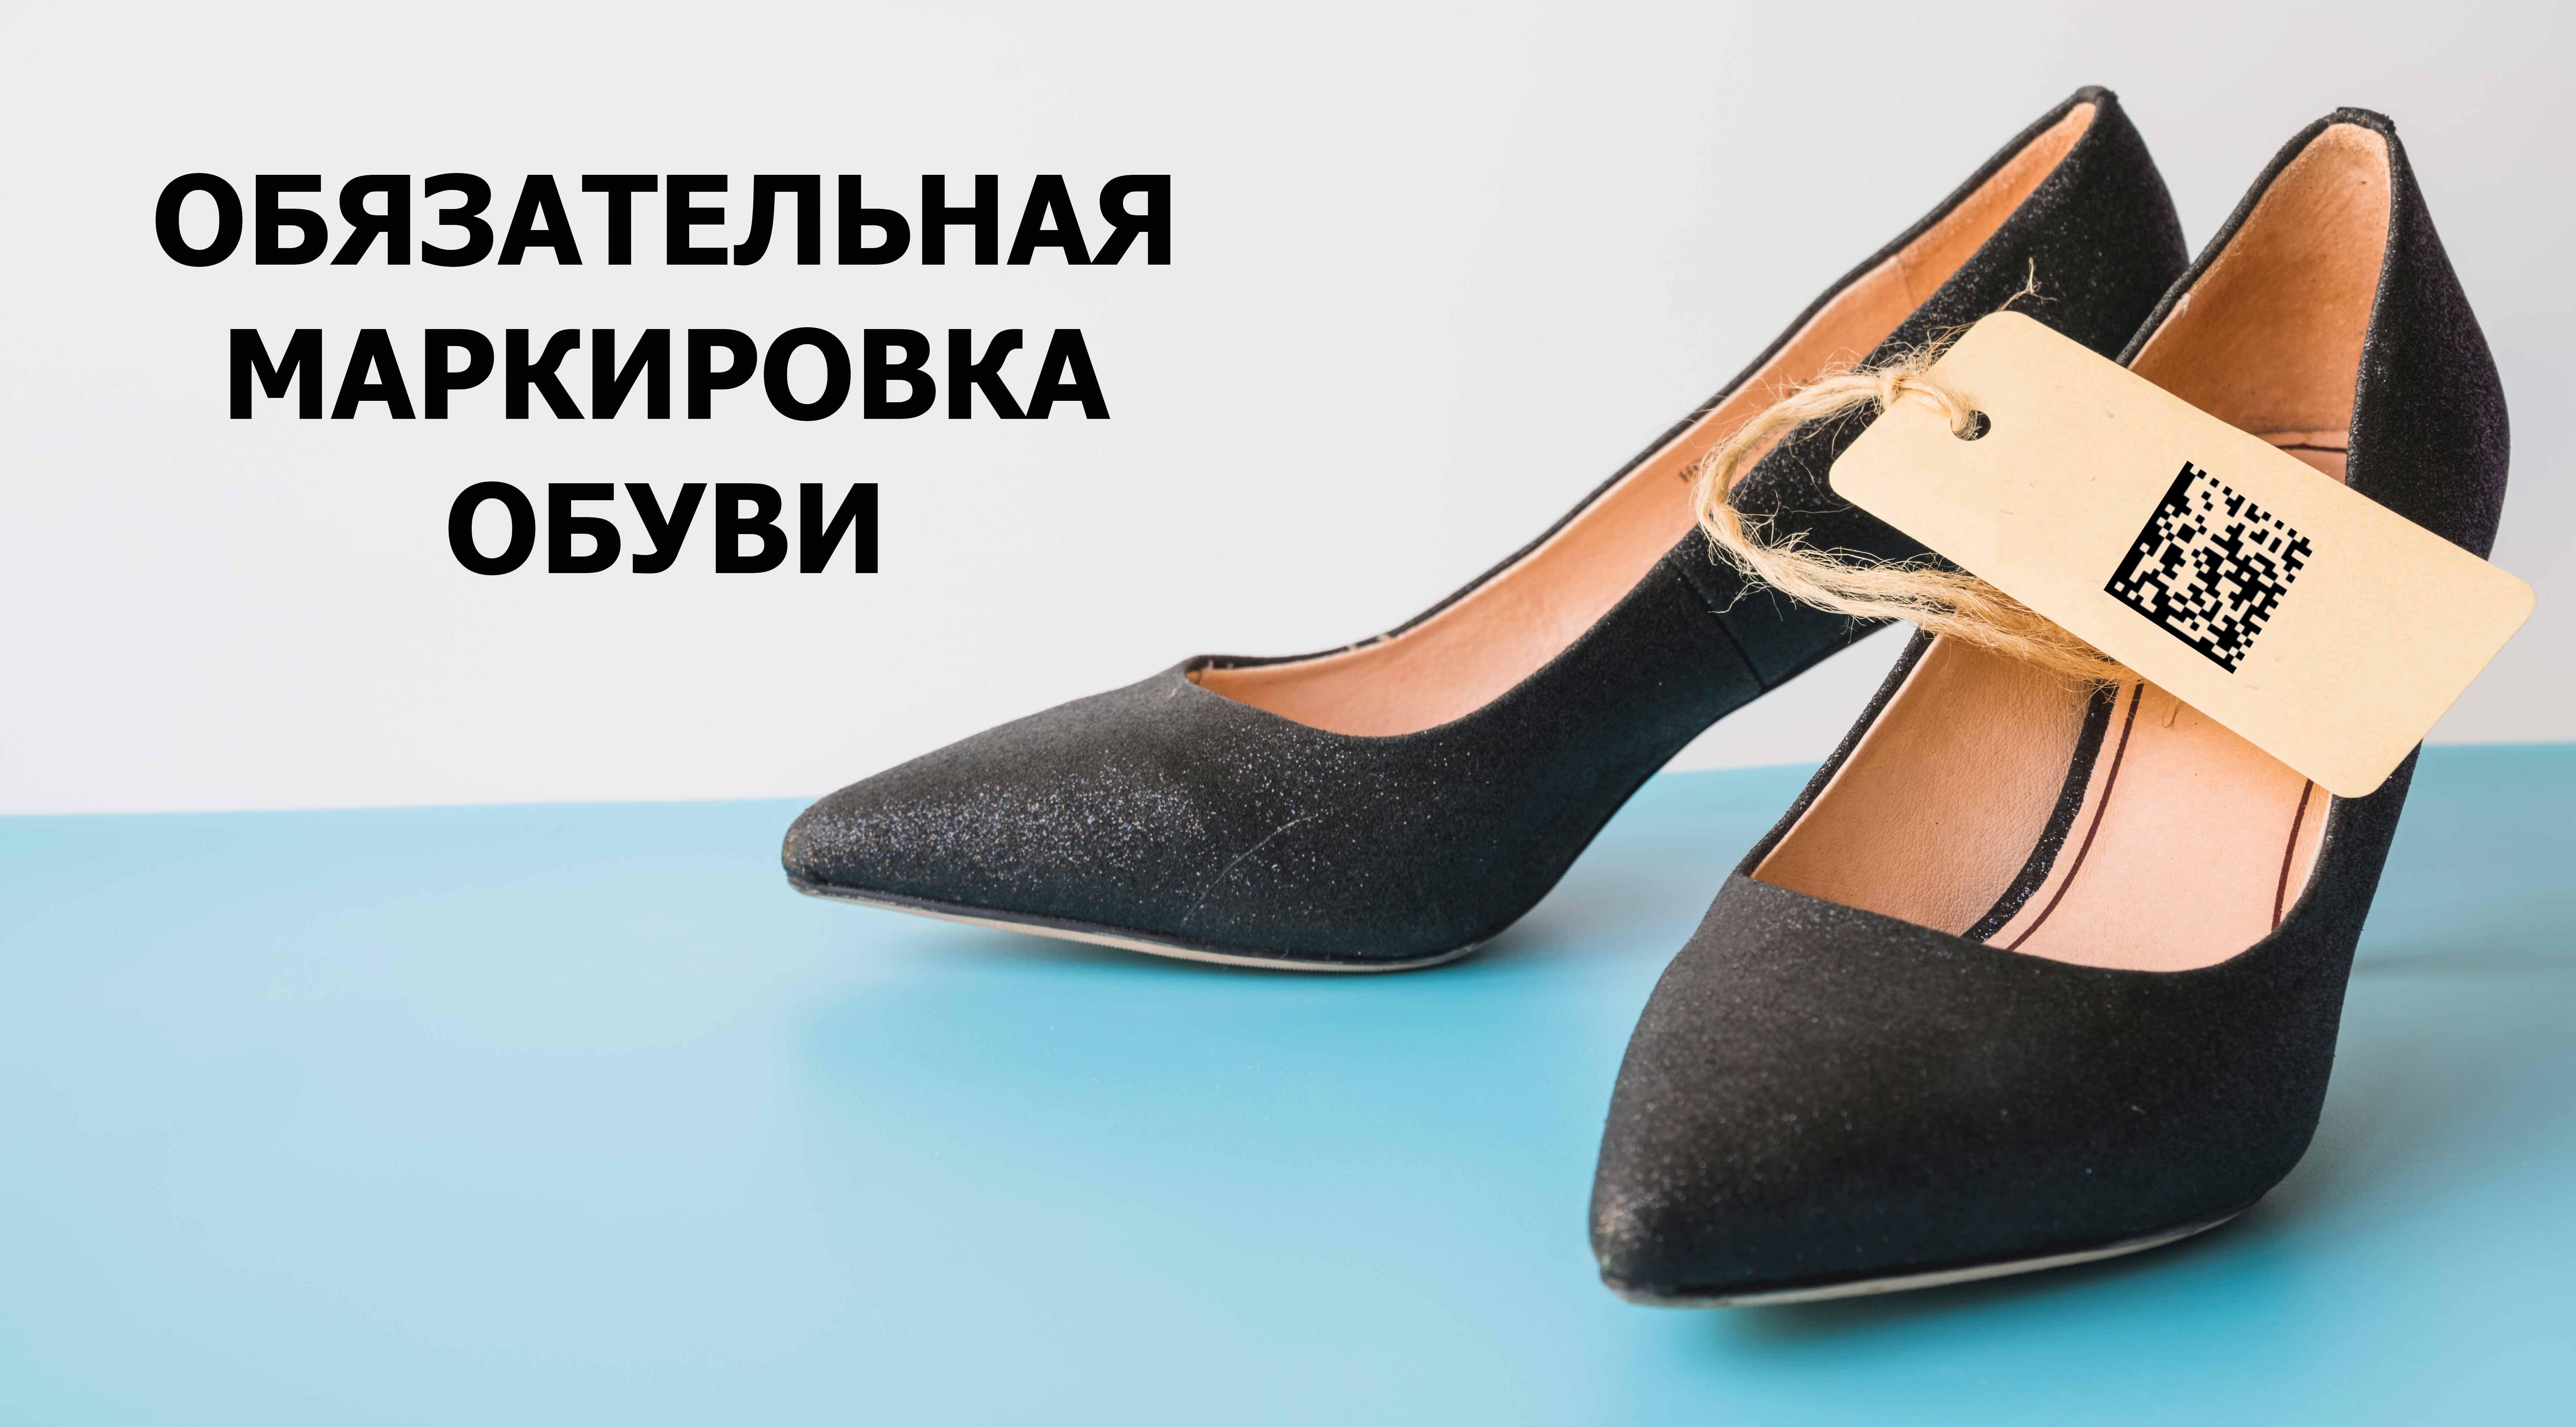 Markirovka_obuvi